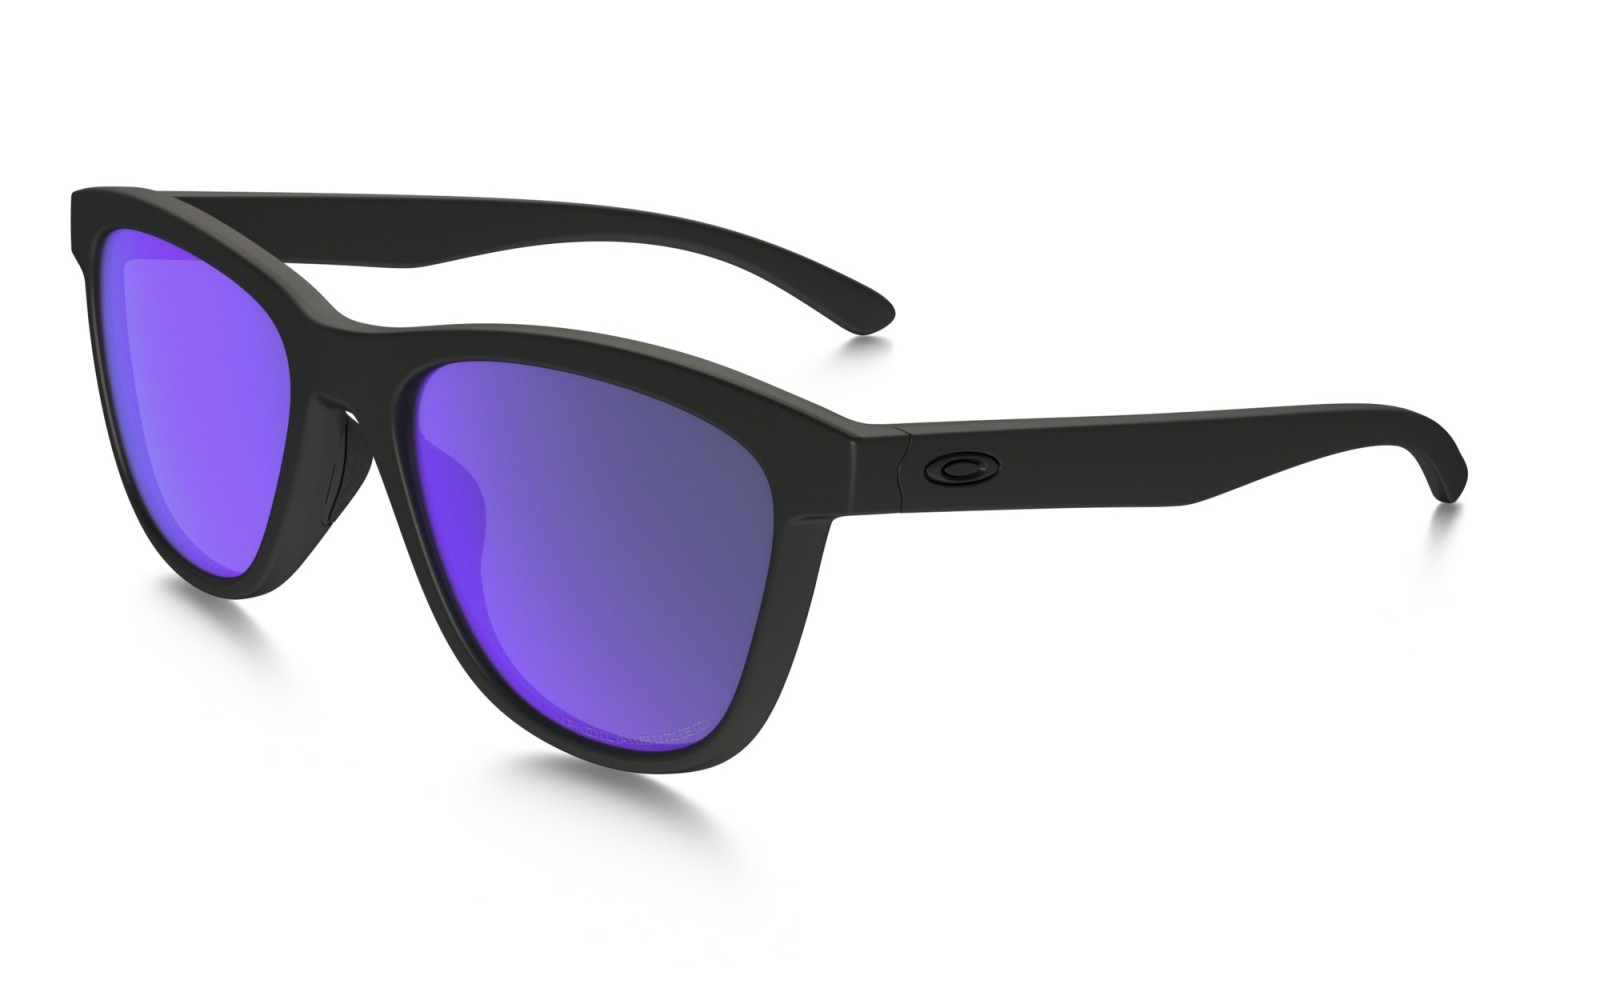 Oakley Moonlighter - Matte Black / Violet Iridium Polarized - OO9320-09 Zonnebril